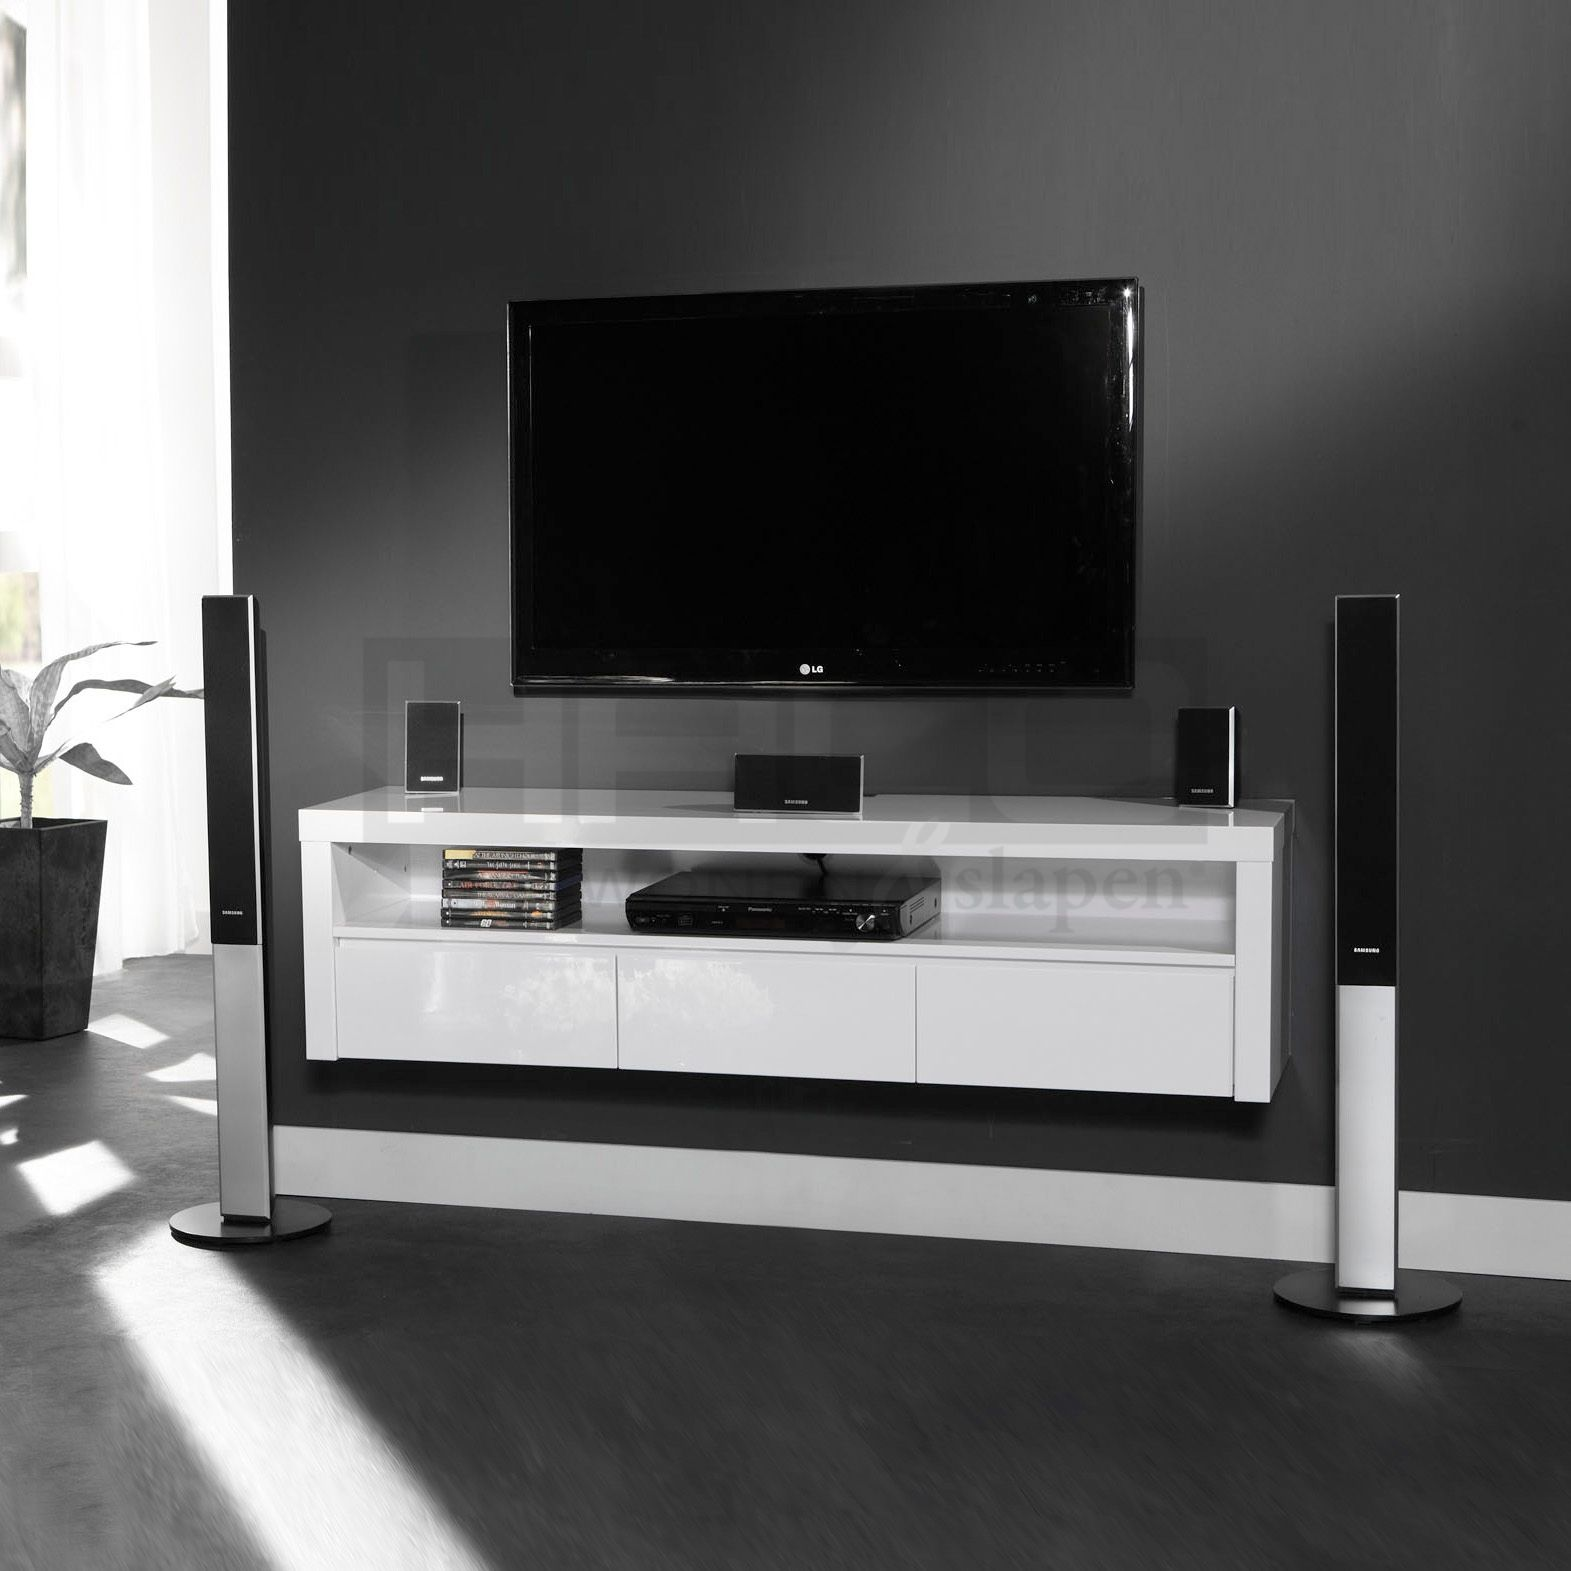 Haco tv meubel hangend cool 150cm moodboard cantate for Muebles tv colgados